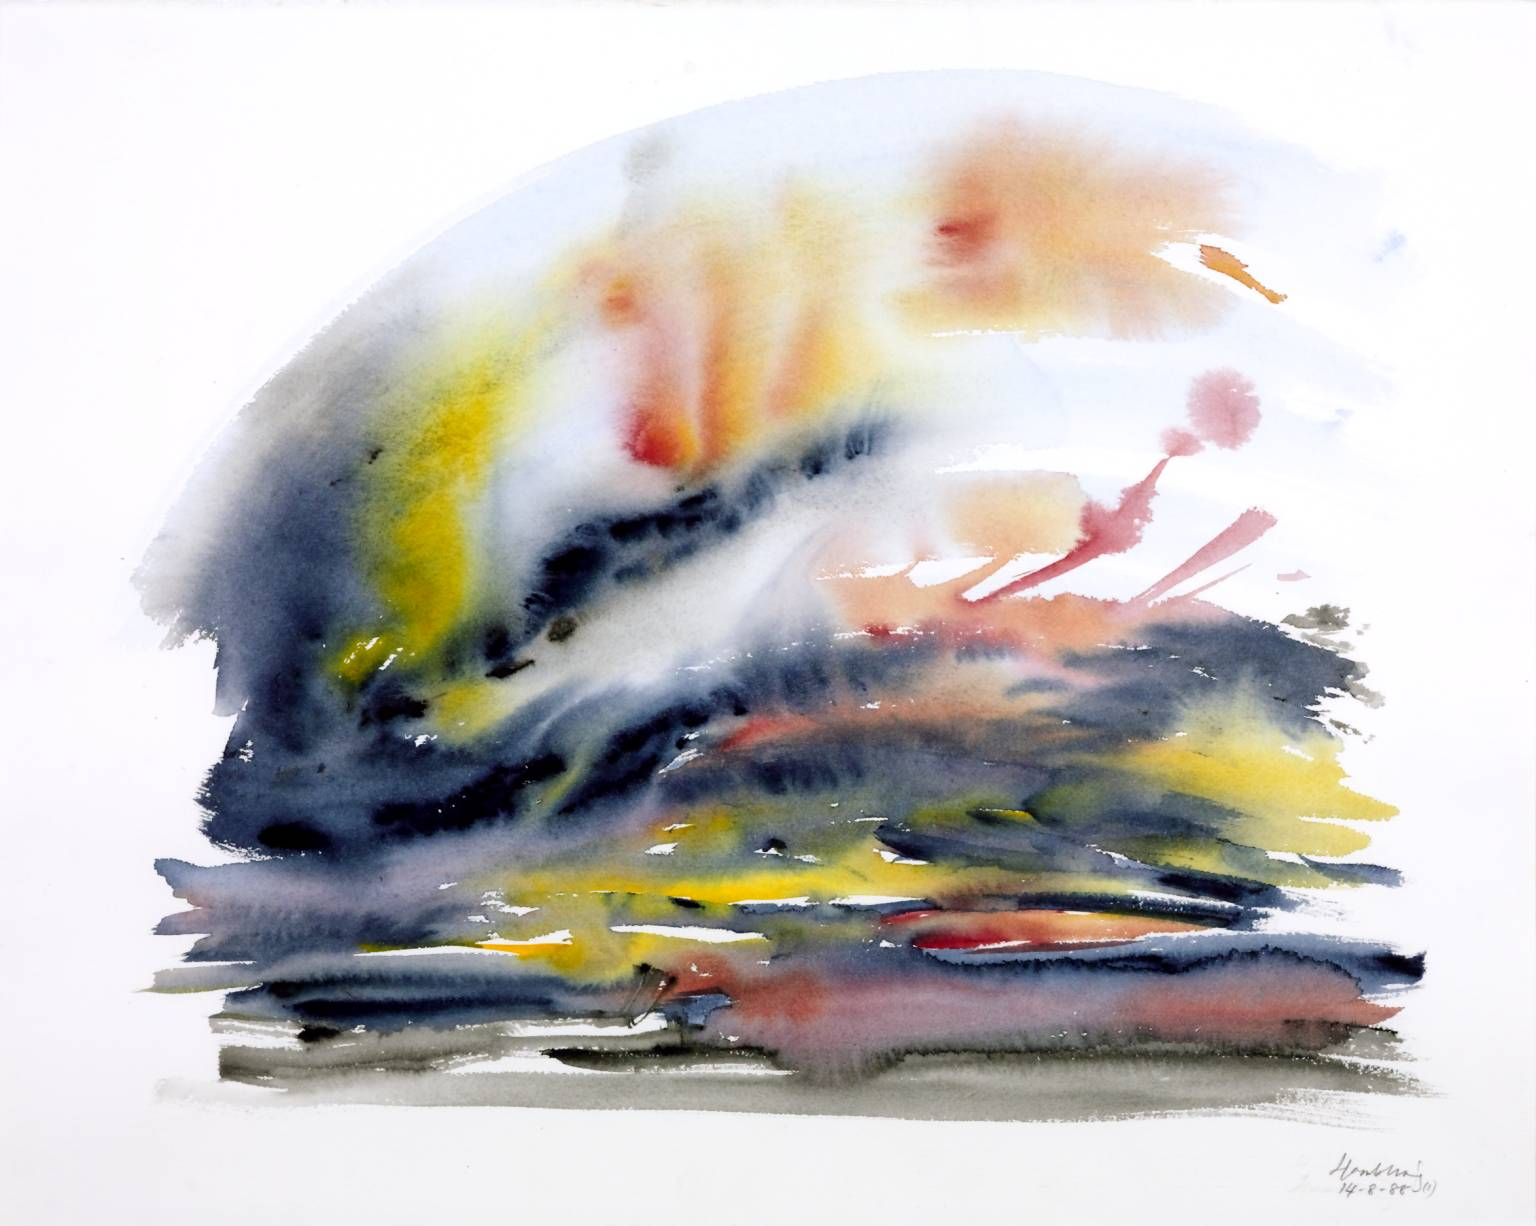 Sunrise, Maggi Hambling 1990